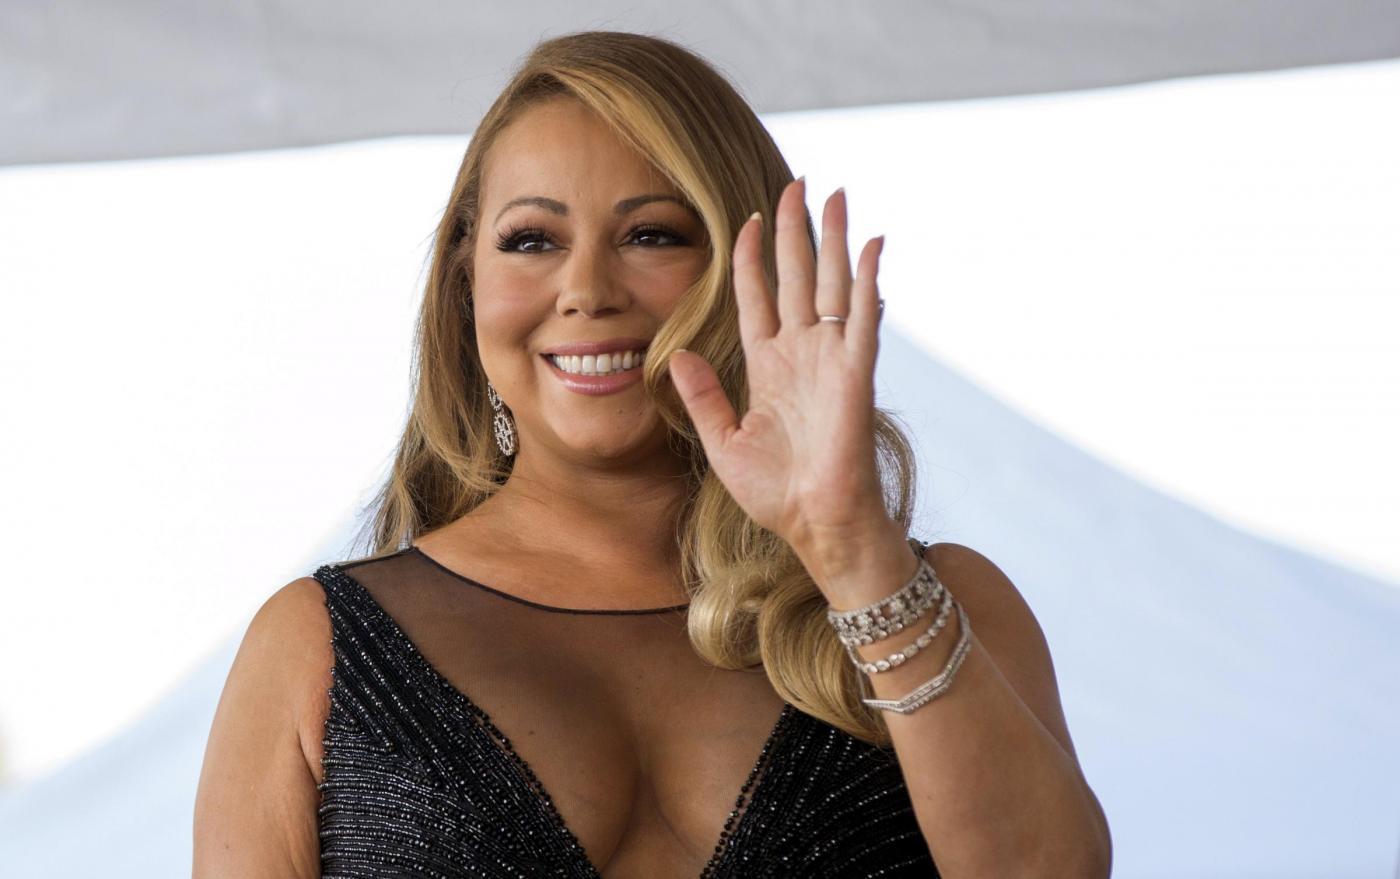 Mariah Carey riceve la stella sulla Hollywood Walk of Fame 10